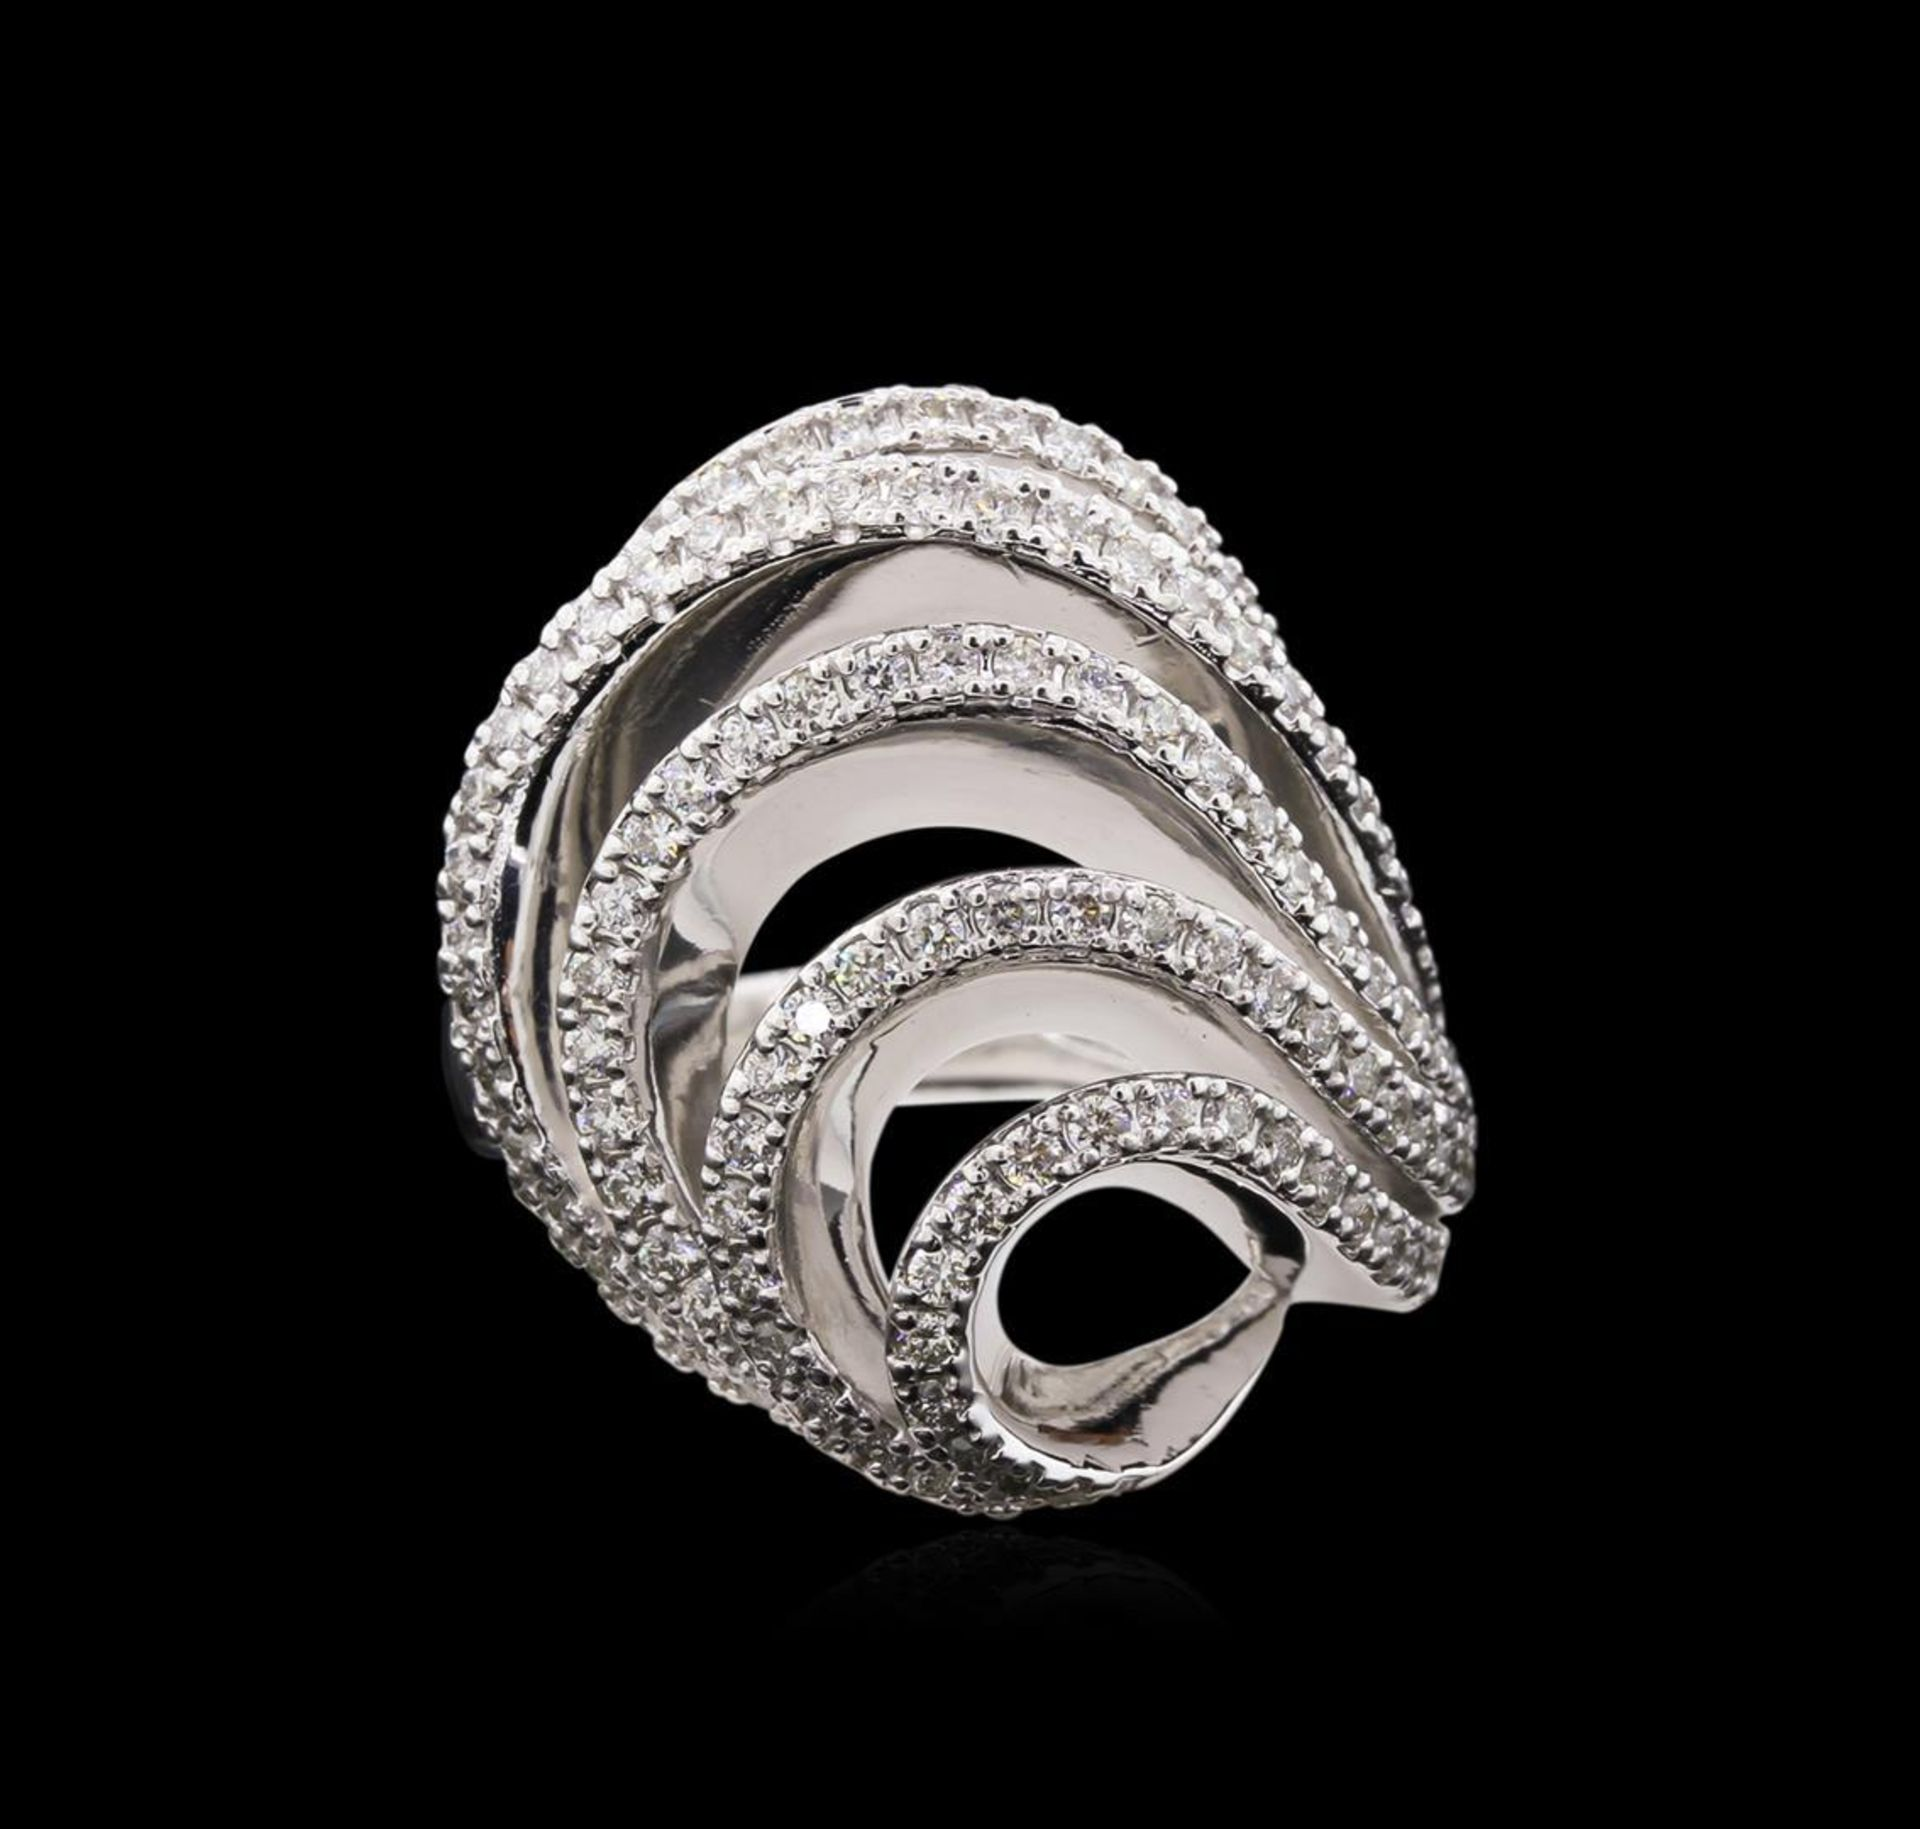 1.11 ctw Diamond Ring - 14KT White Gold - Image 2 of 3